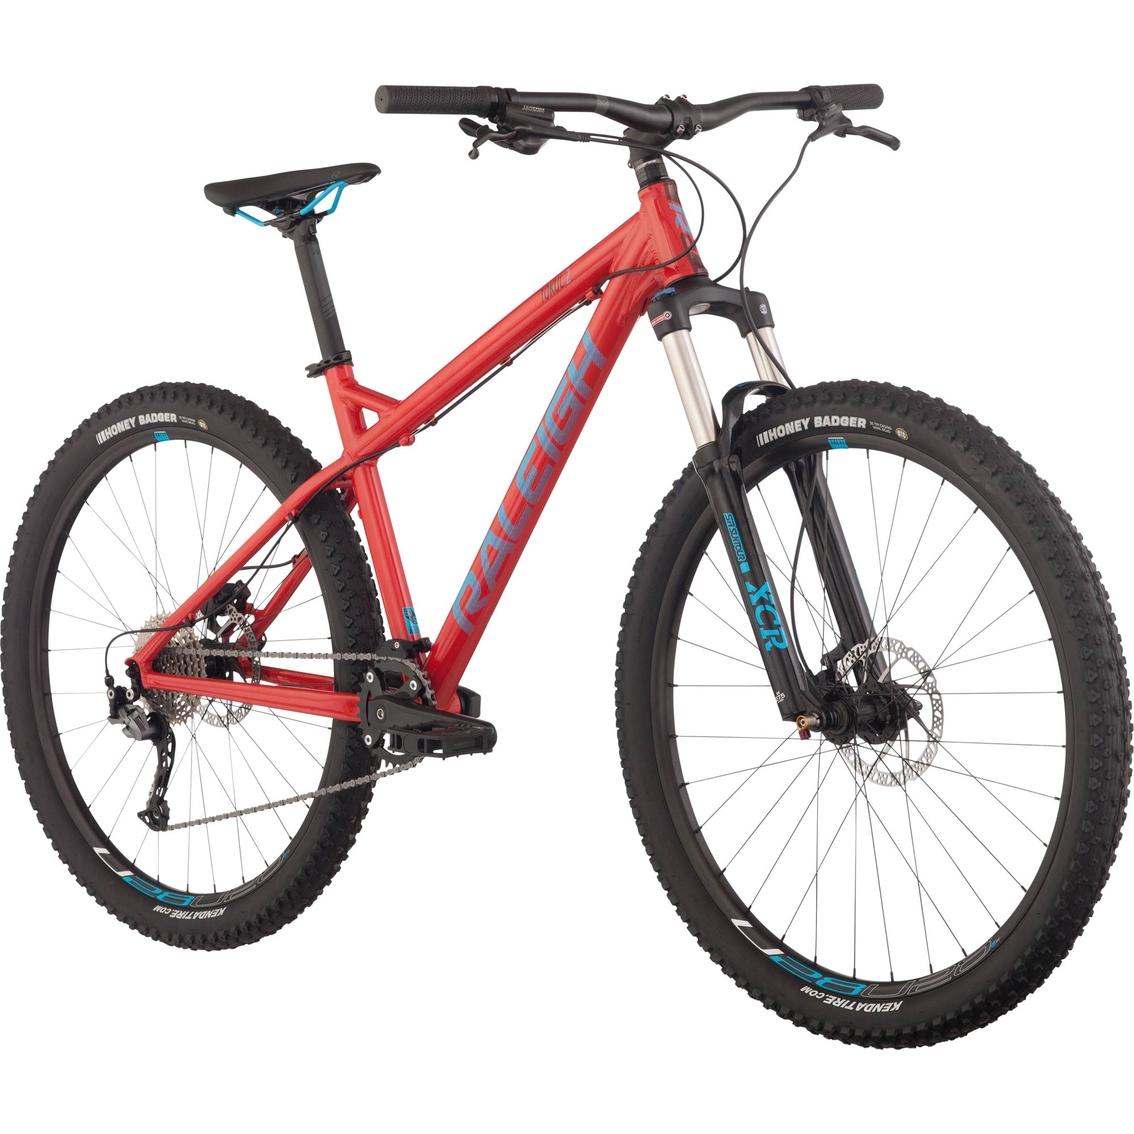 03b3722e620 Raleigh Tokul 2 Mountain Bike